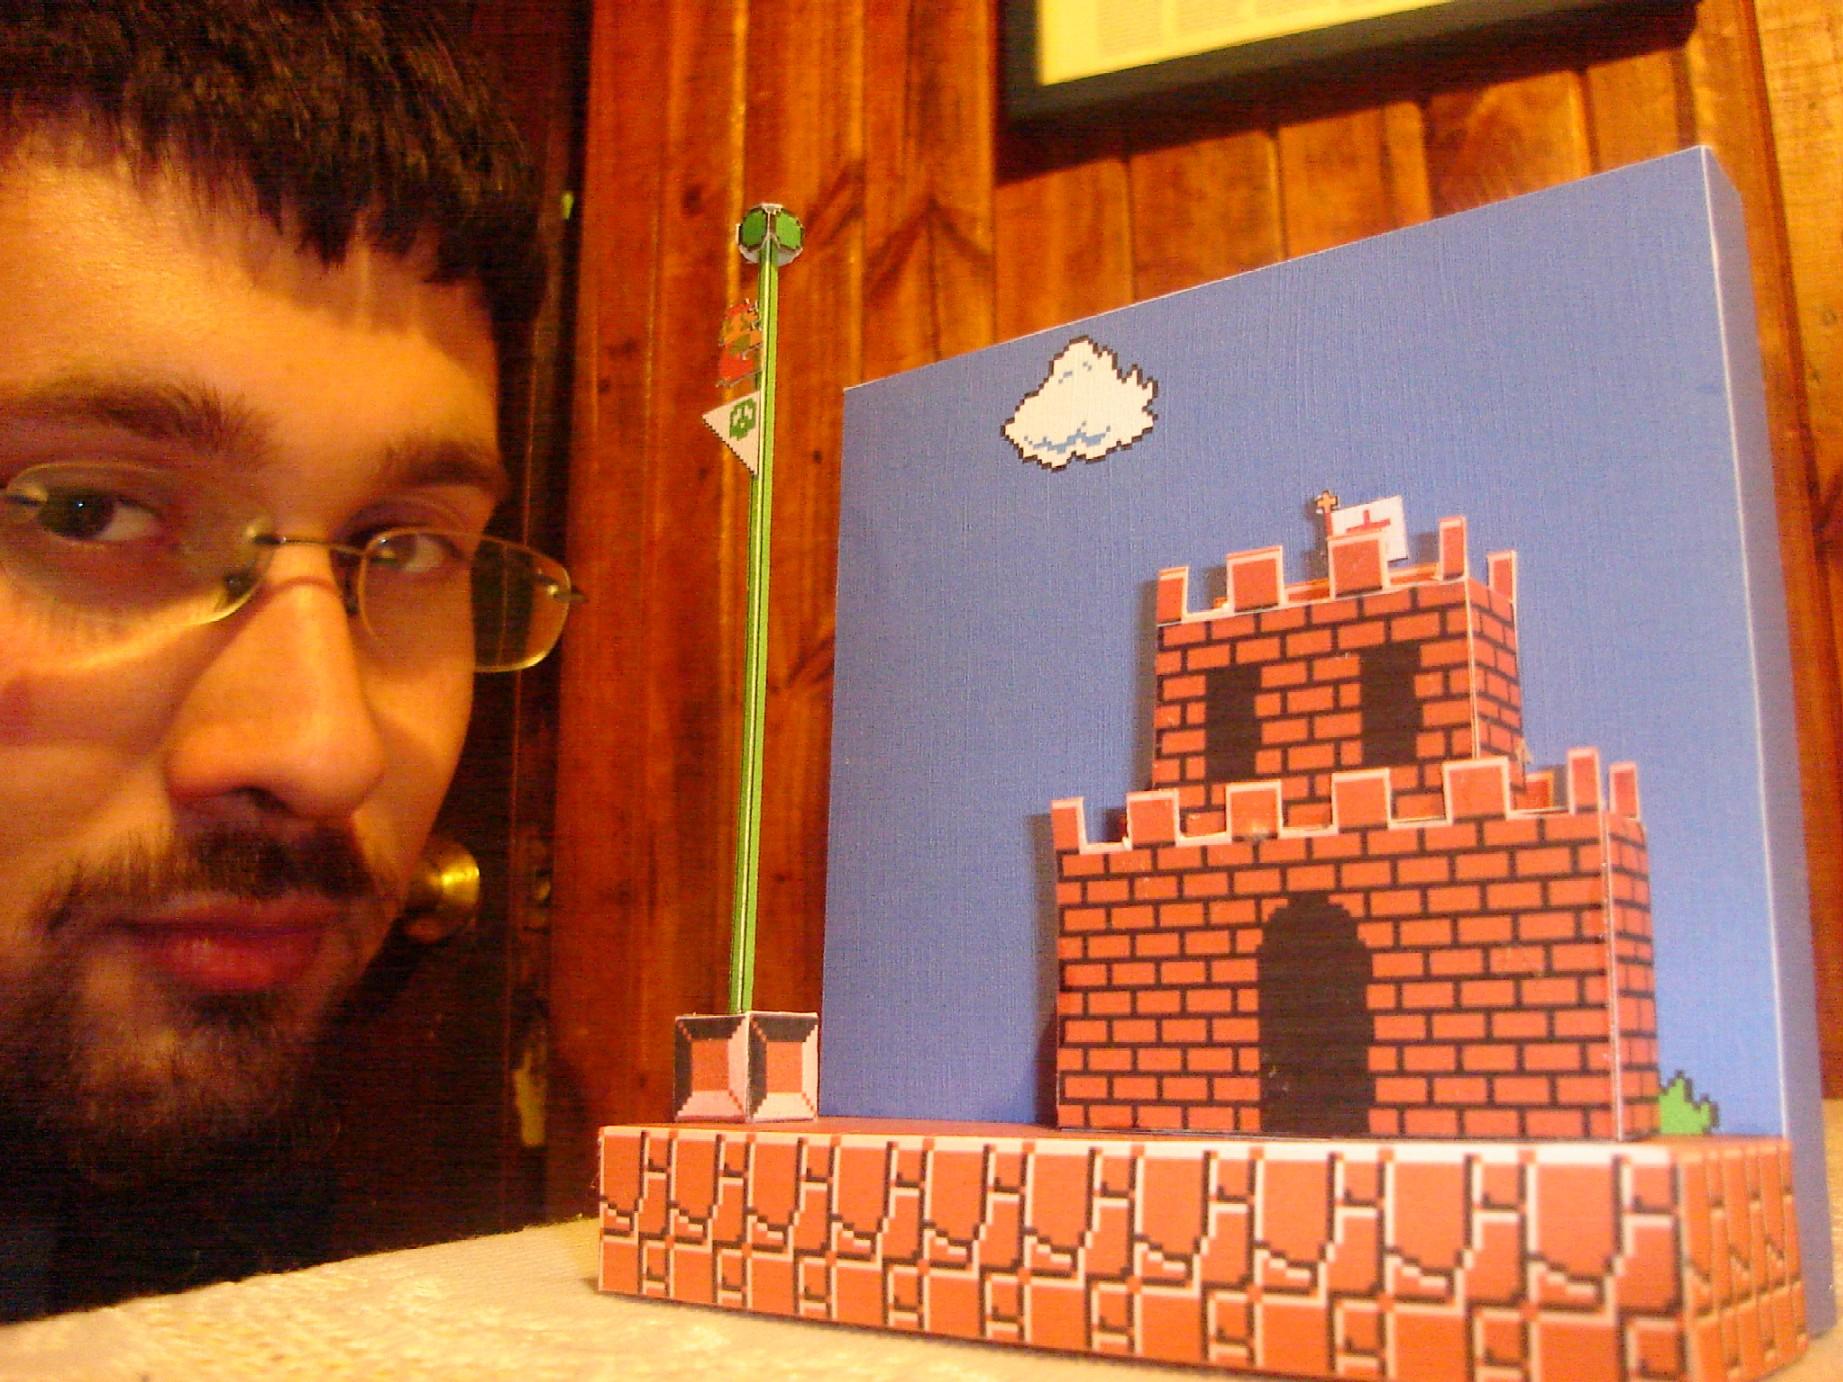 Mario W1-1 Papercraft Diorama by ryo007